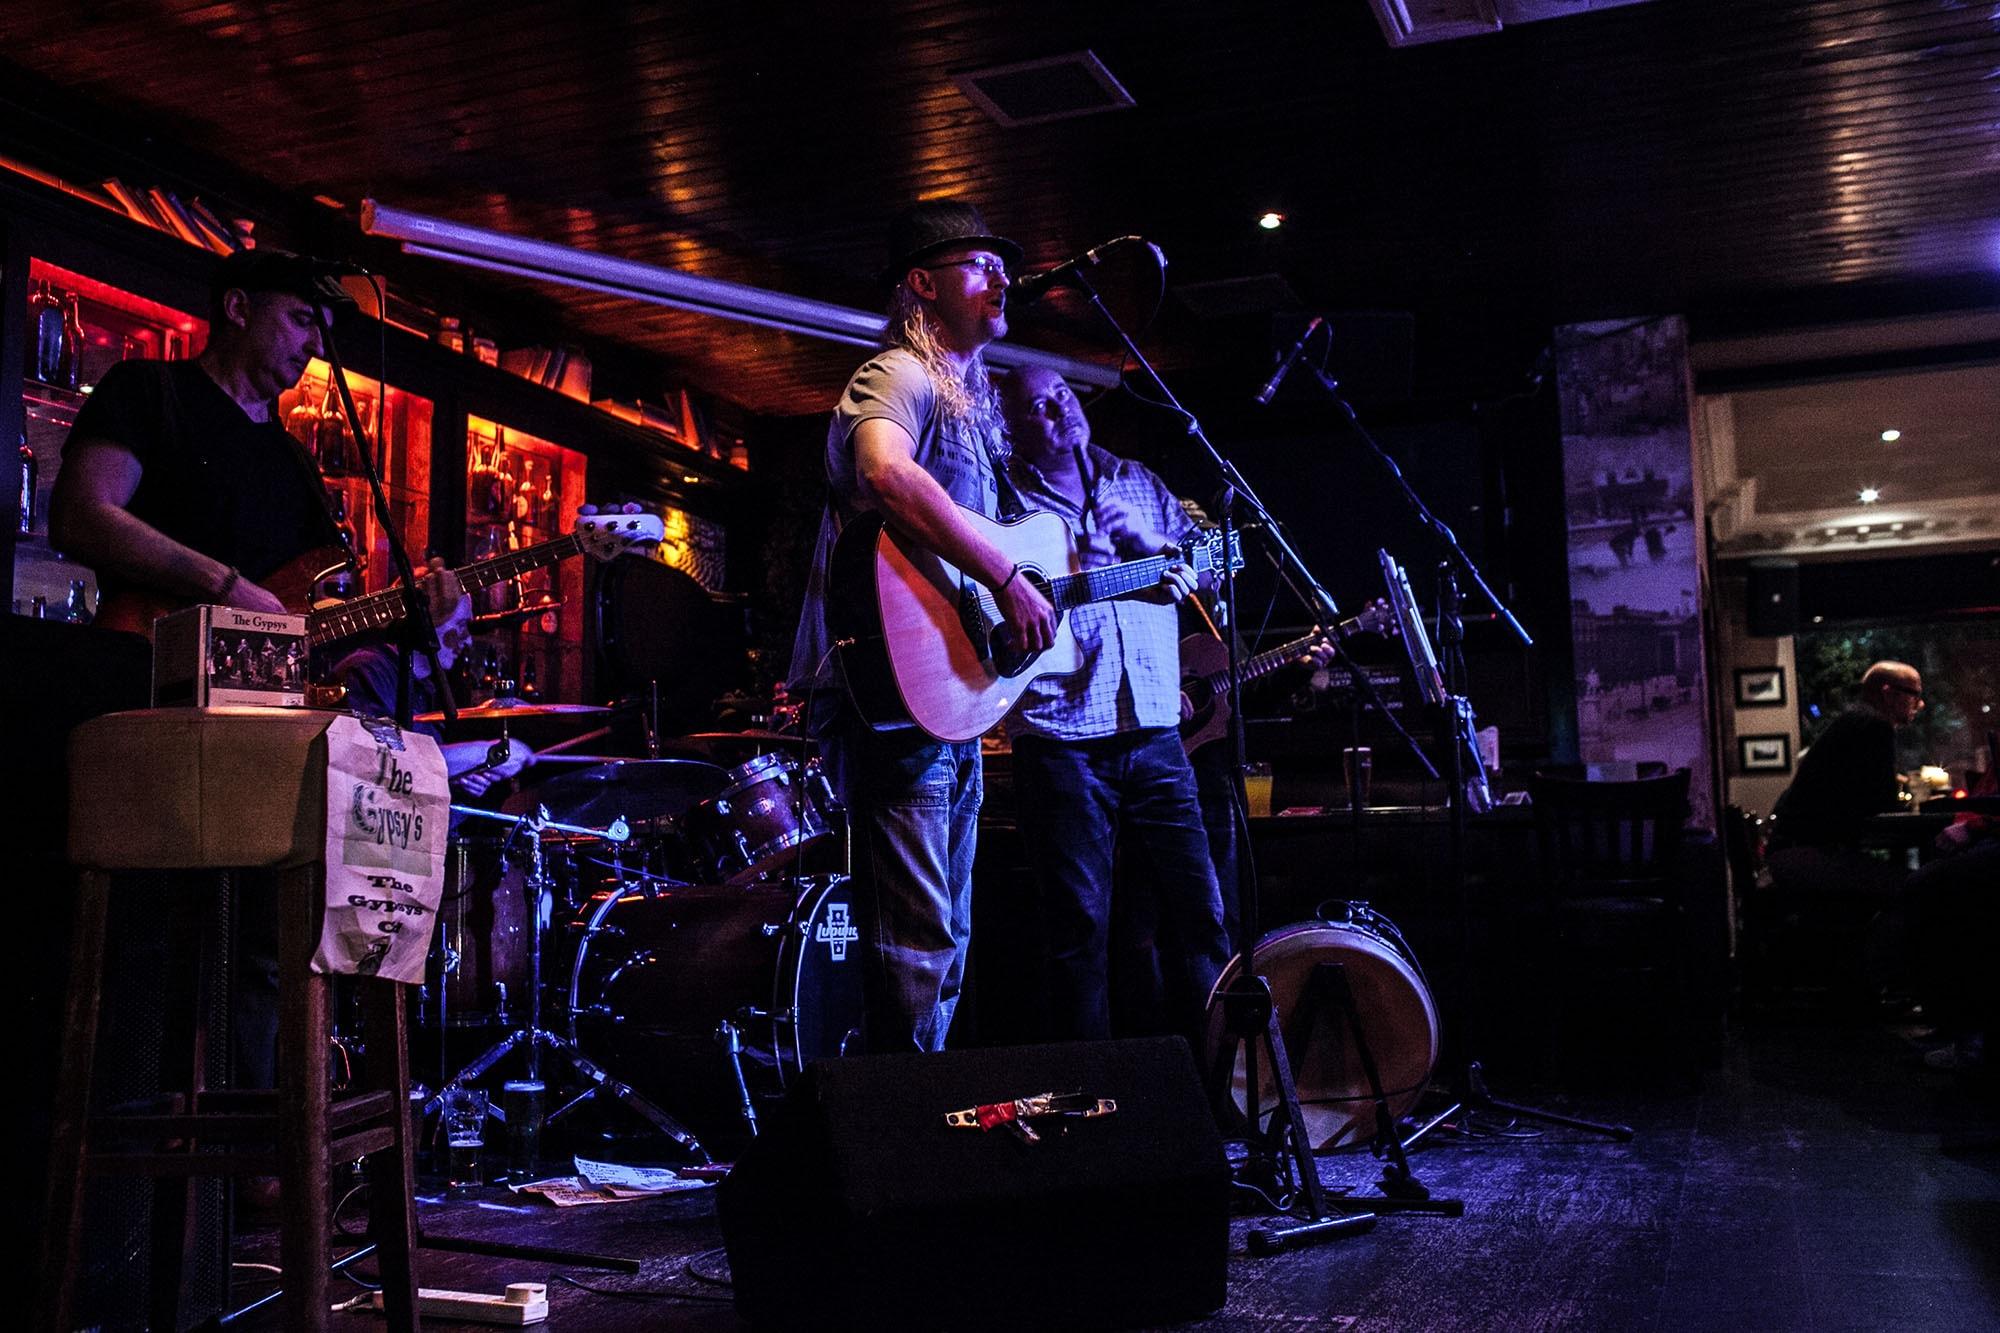 Band playing in a pub - Dublin, Ireland